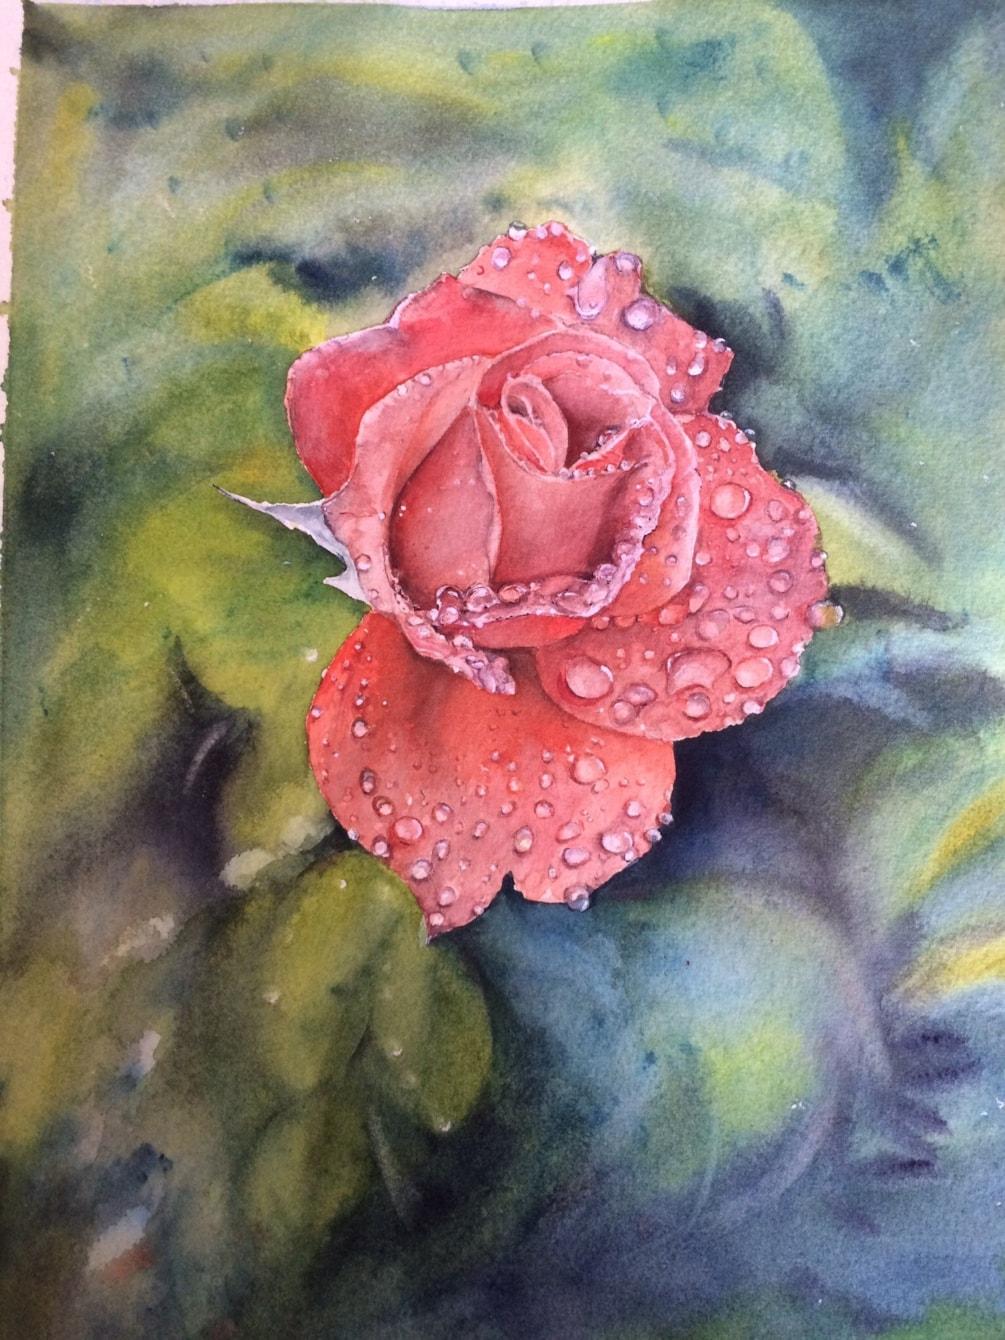 Rose with rain